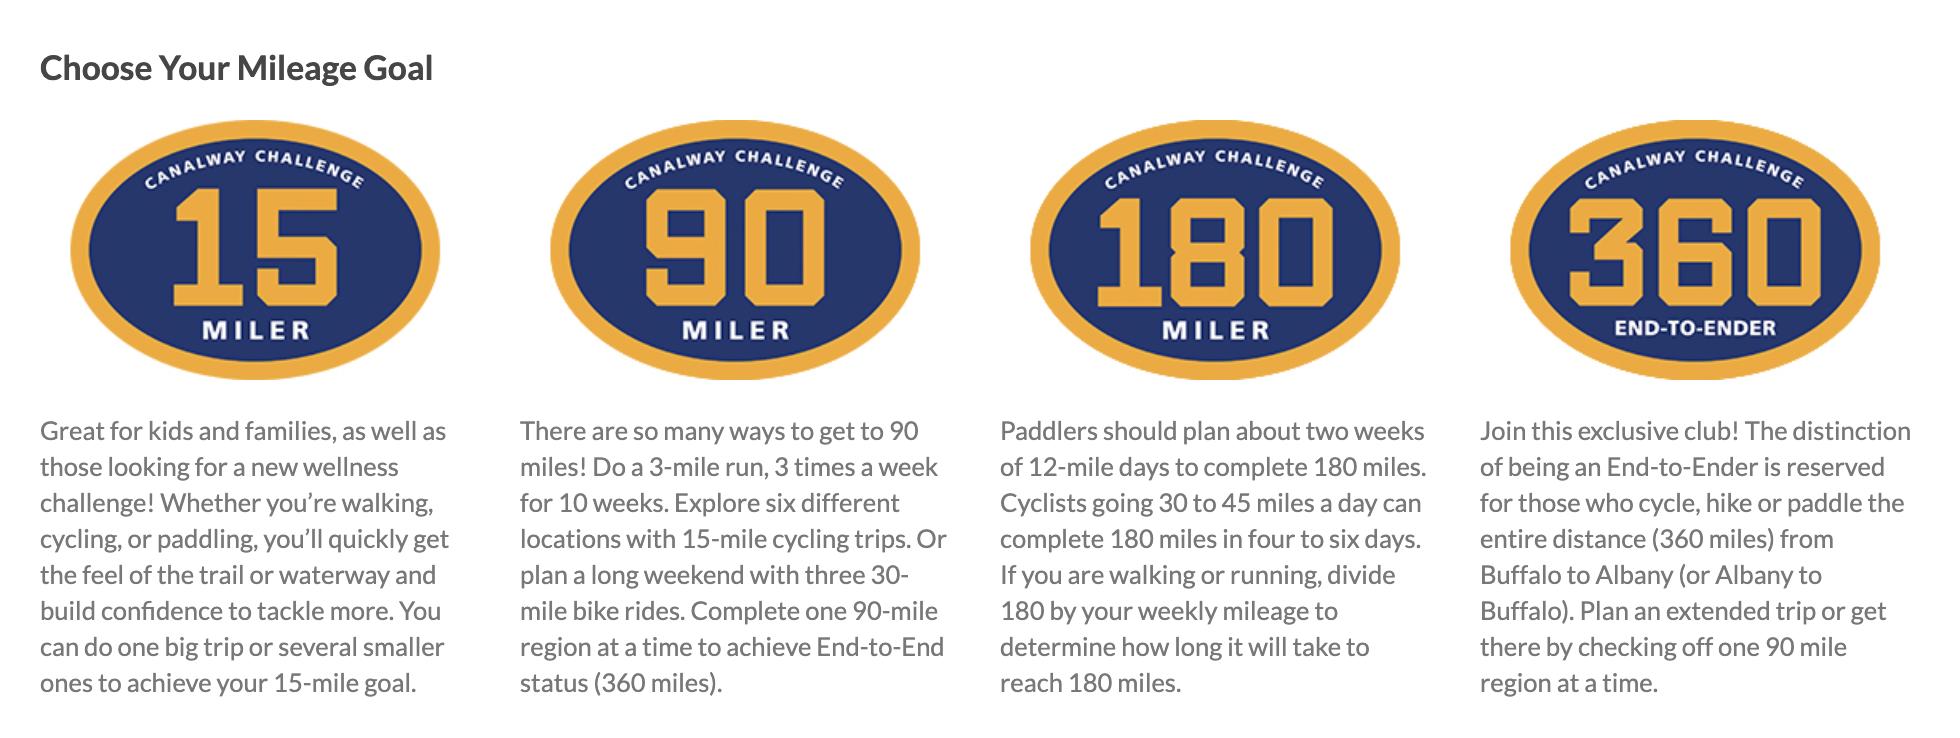 choose your mileage goal